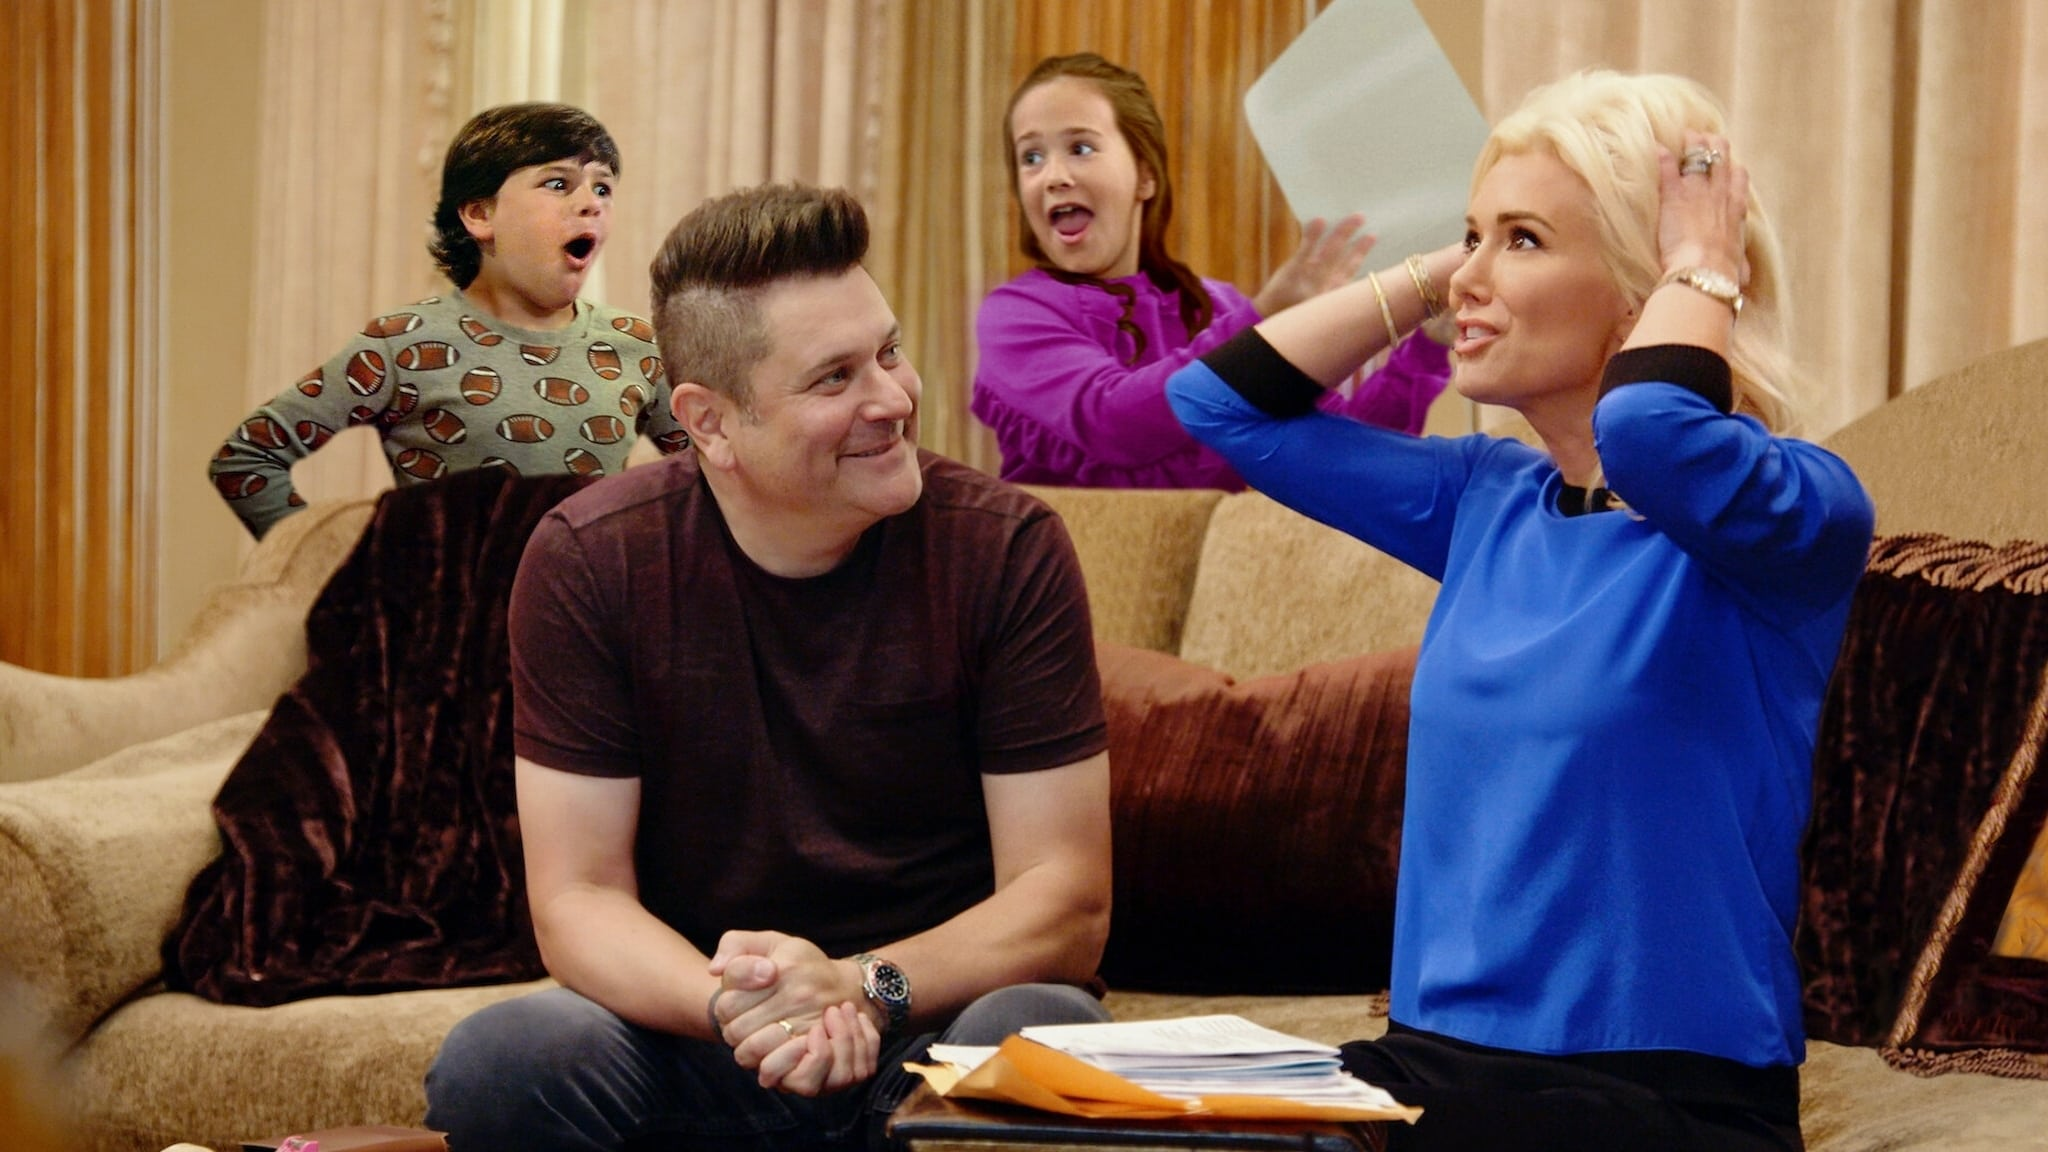 DeMarcus Family Rules Season 1 Episode 1